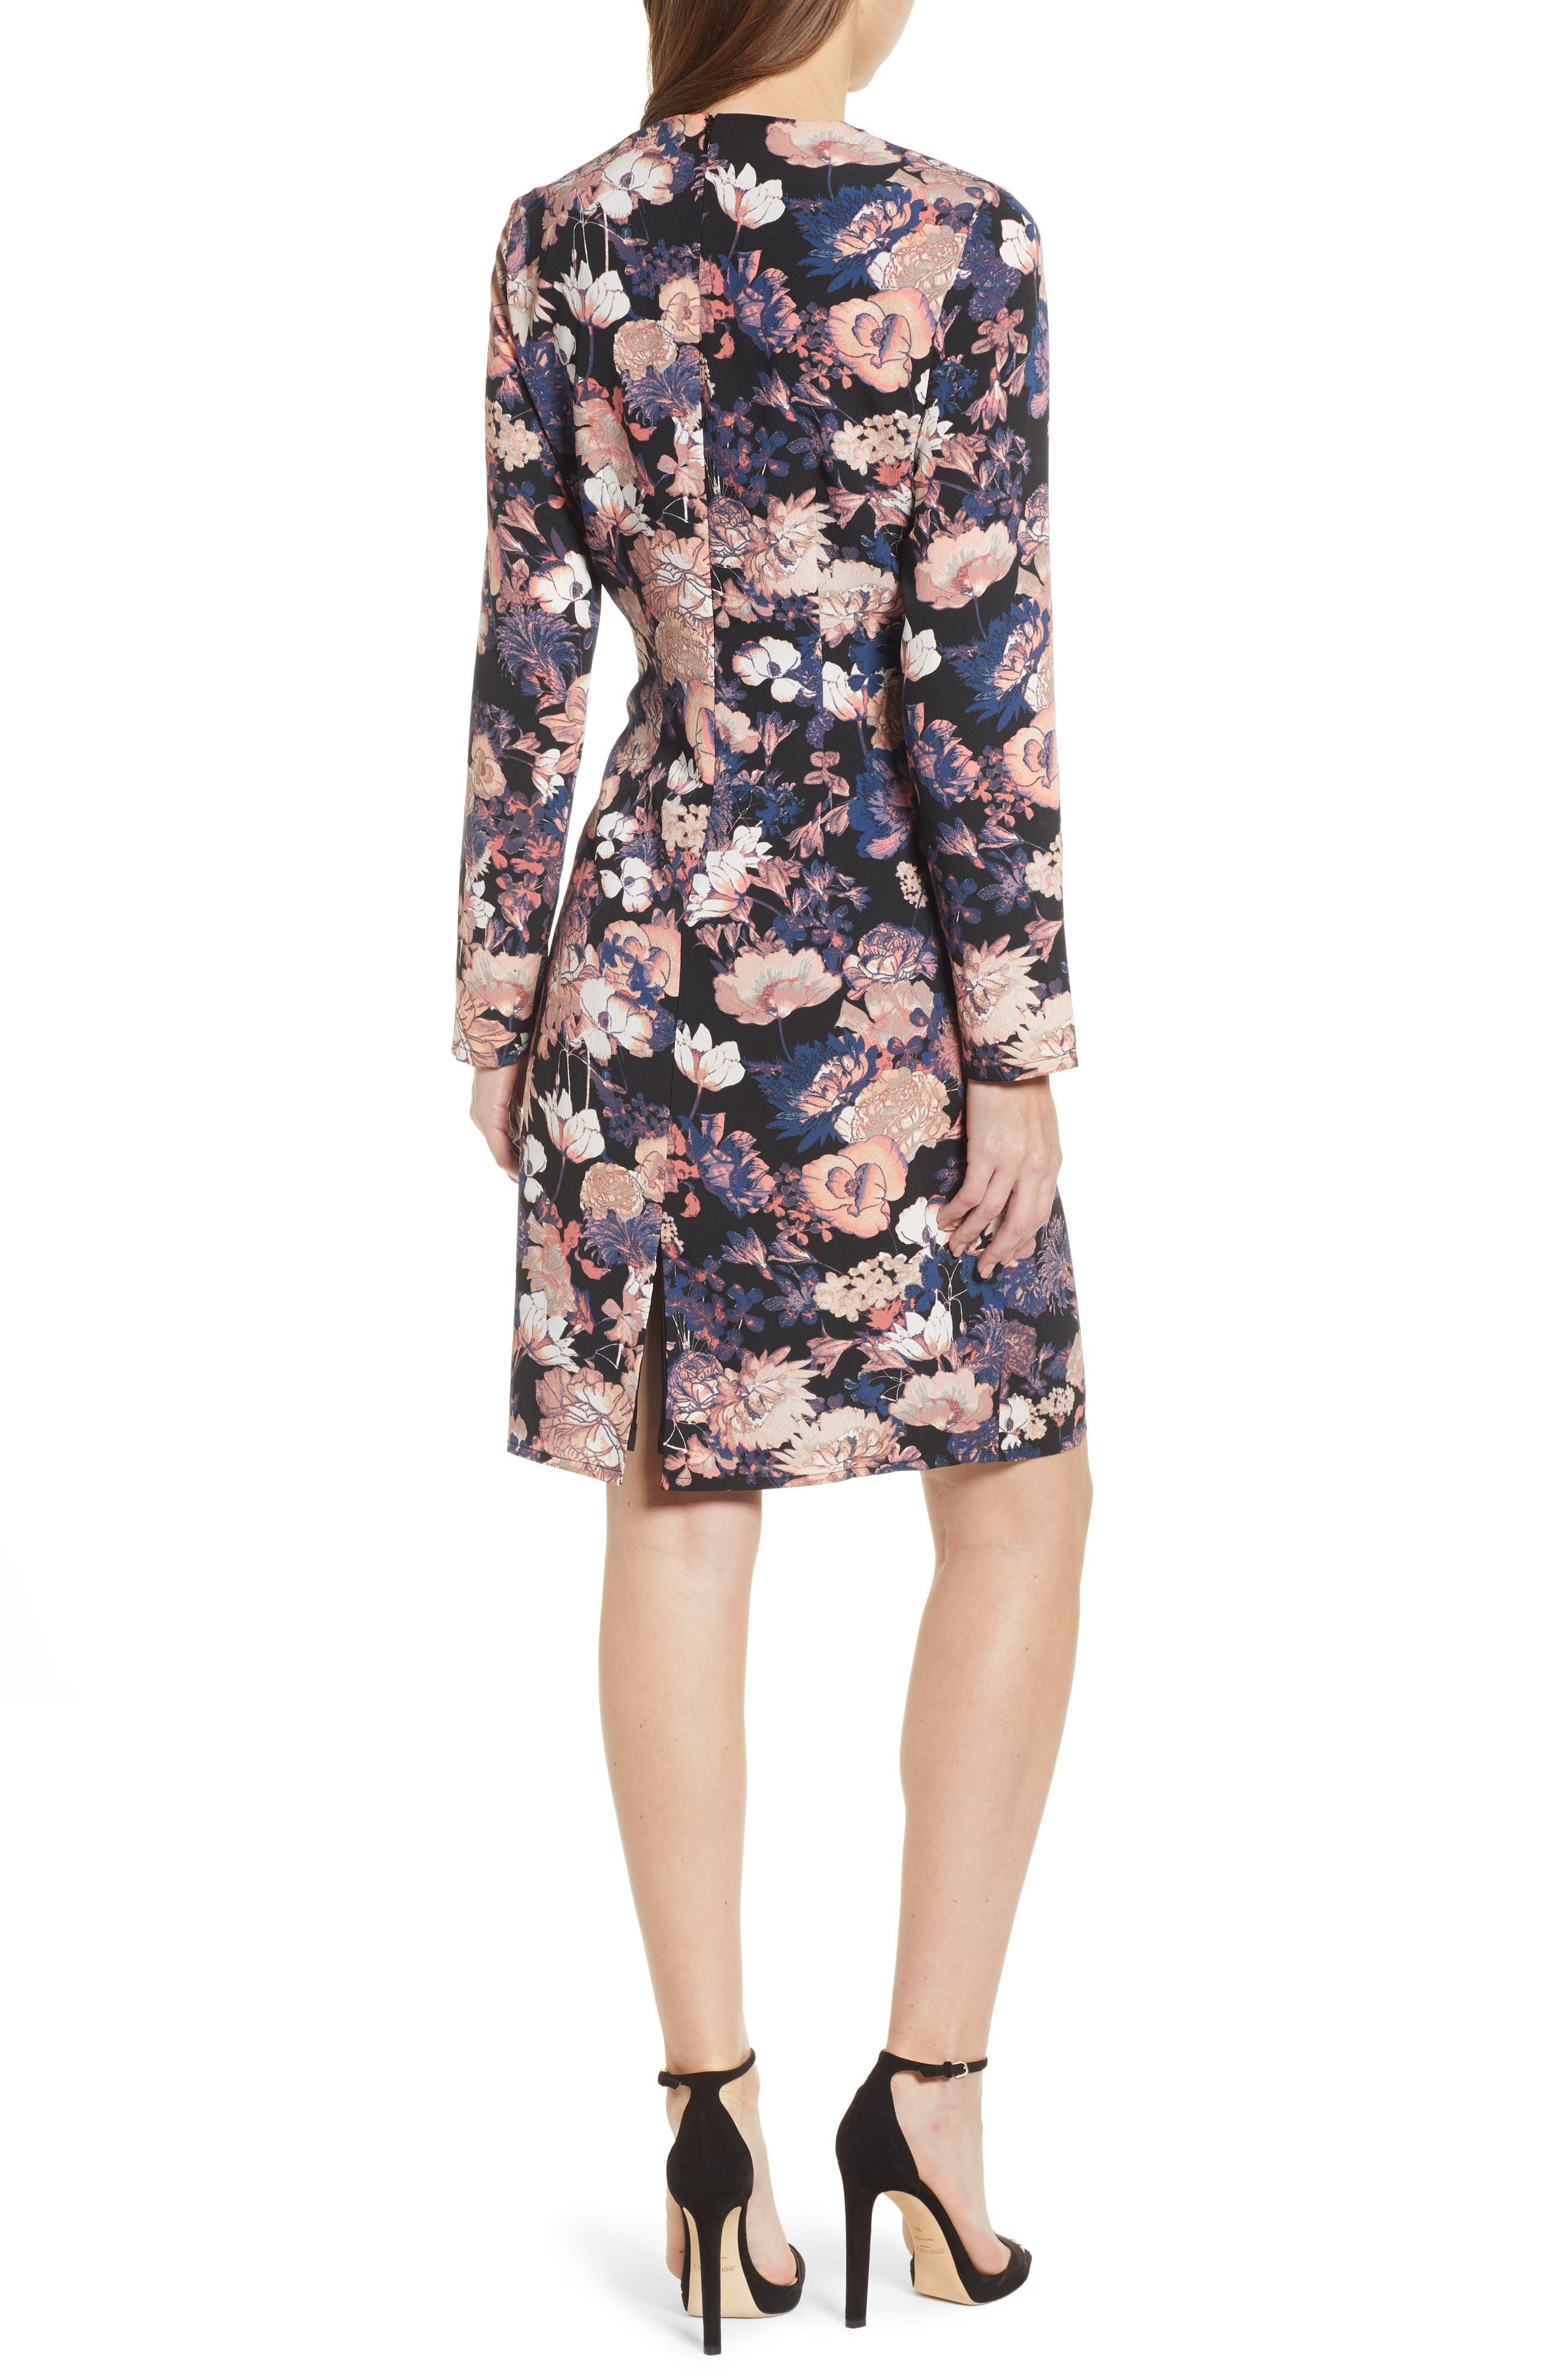 VERO MODA,                             Marlene Floral Drape Dress,                             Alternate thumbnail 2, color,                             BLACK PRINT